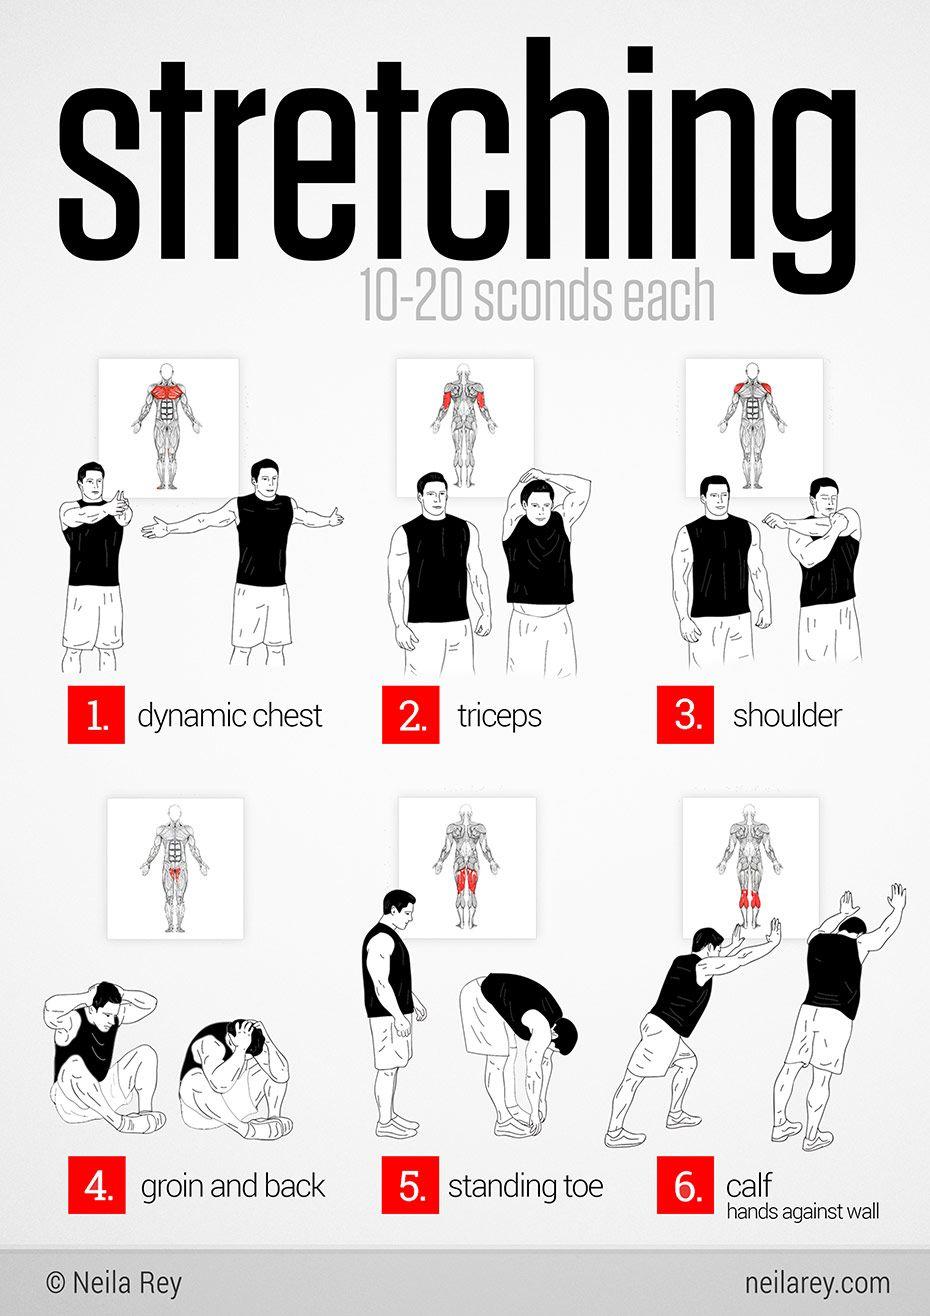 Full body stretching routine. Stretch to gain flexibility